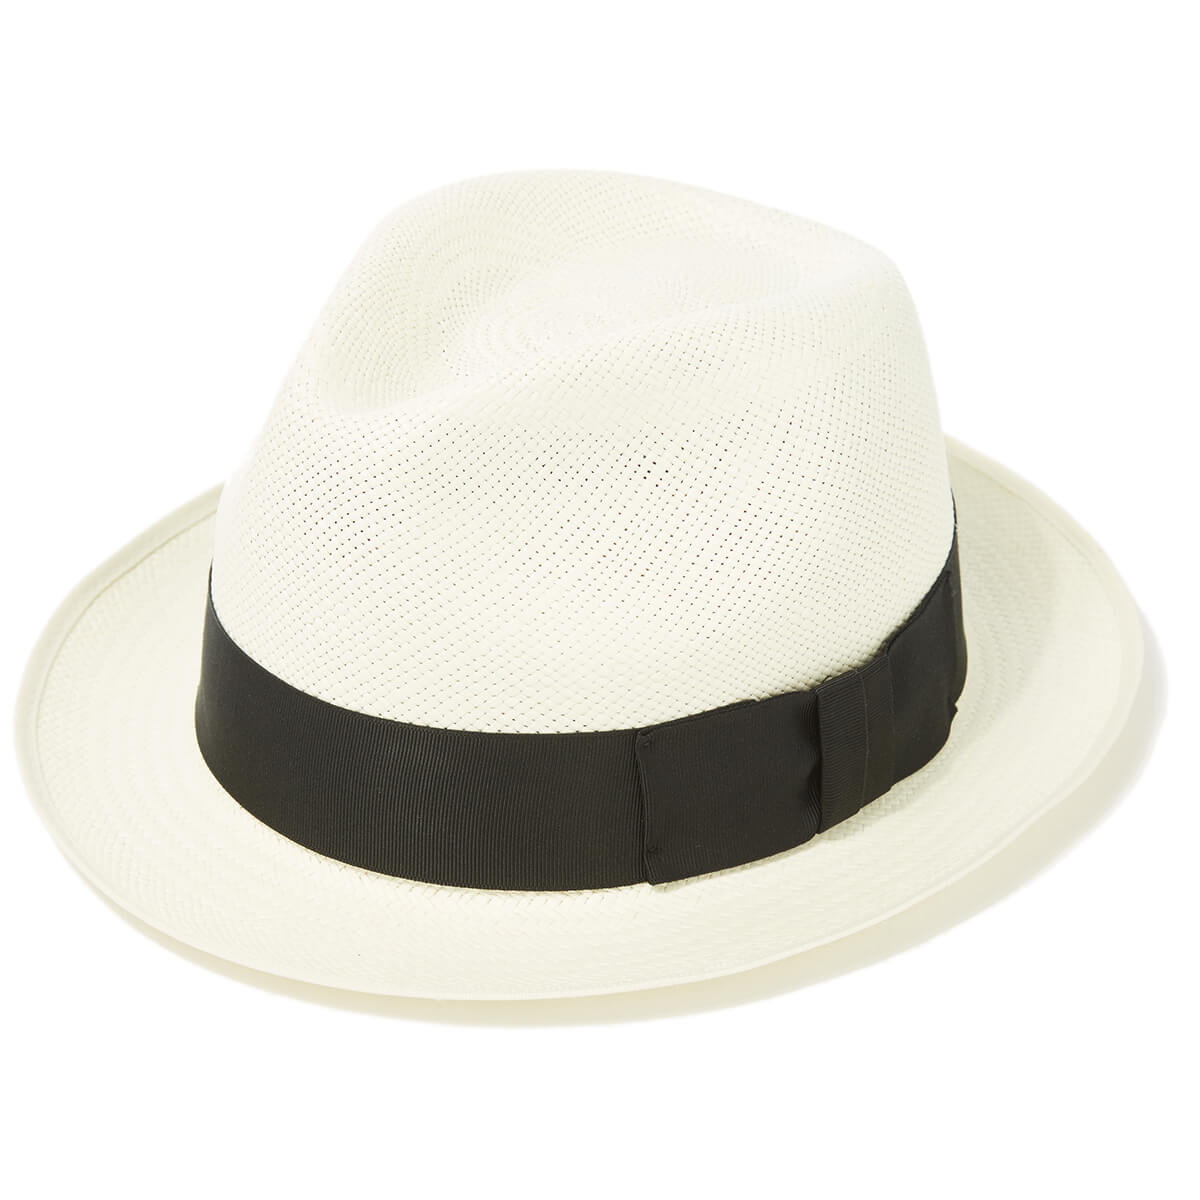 Classic Yorkie Snap Brim Panama in Size 57